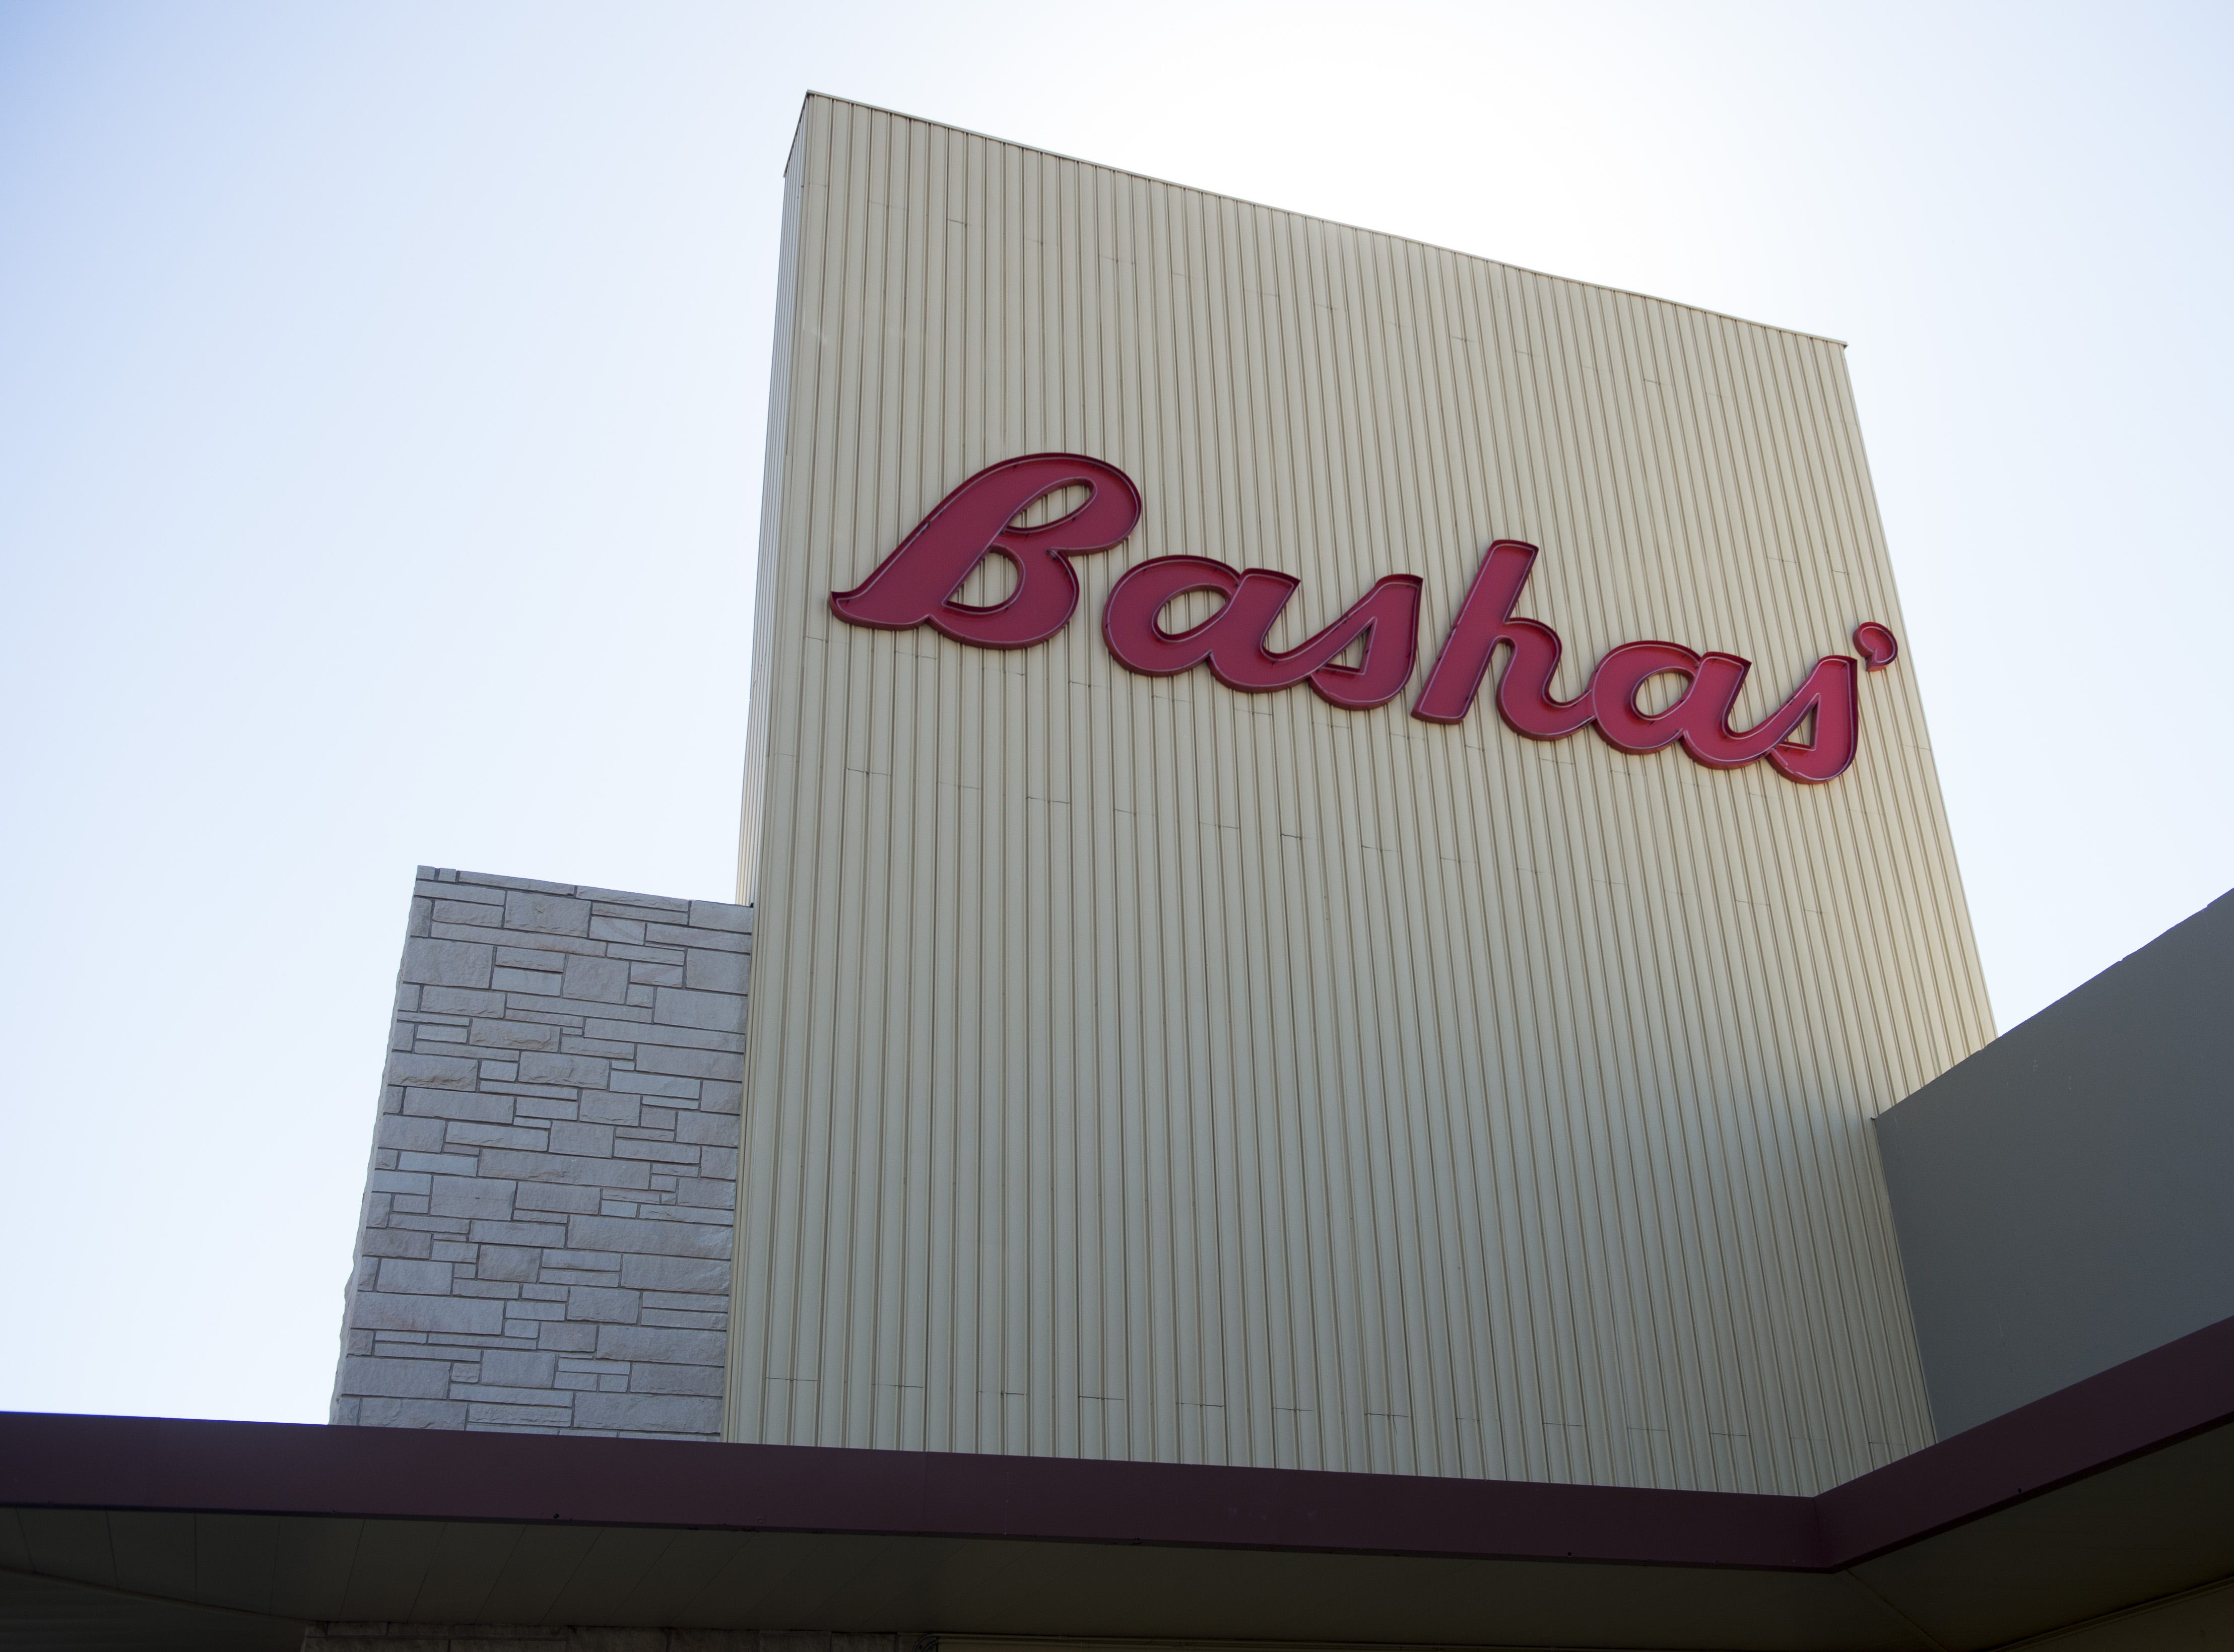 No. 18: Bashas' Supermarkets | Supermarkets | 2019 employees: 8,519 | 2018 employees: 8,498 | Ownership: Private | Headquarters: Chandler | www.bashas.com